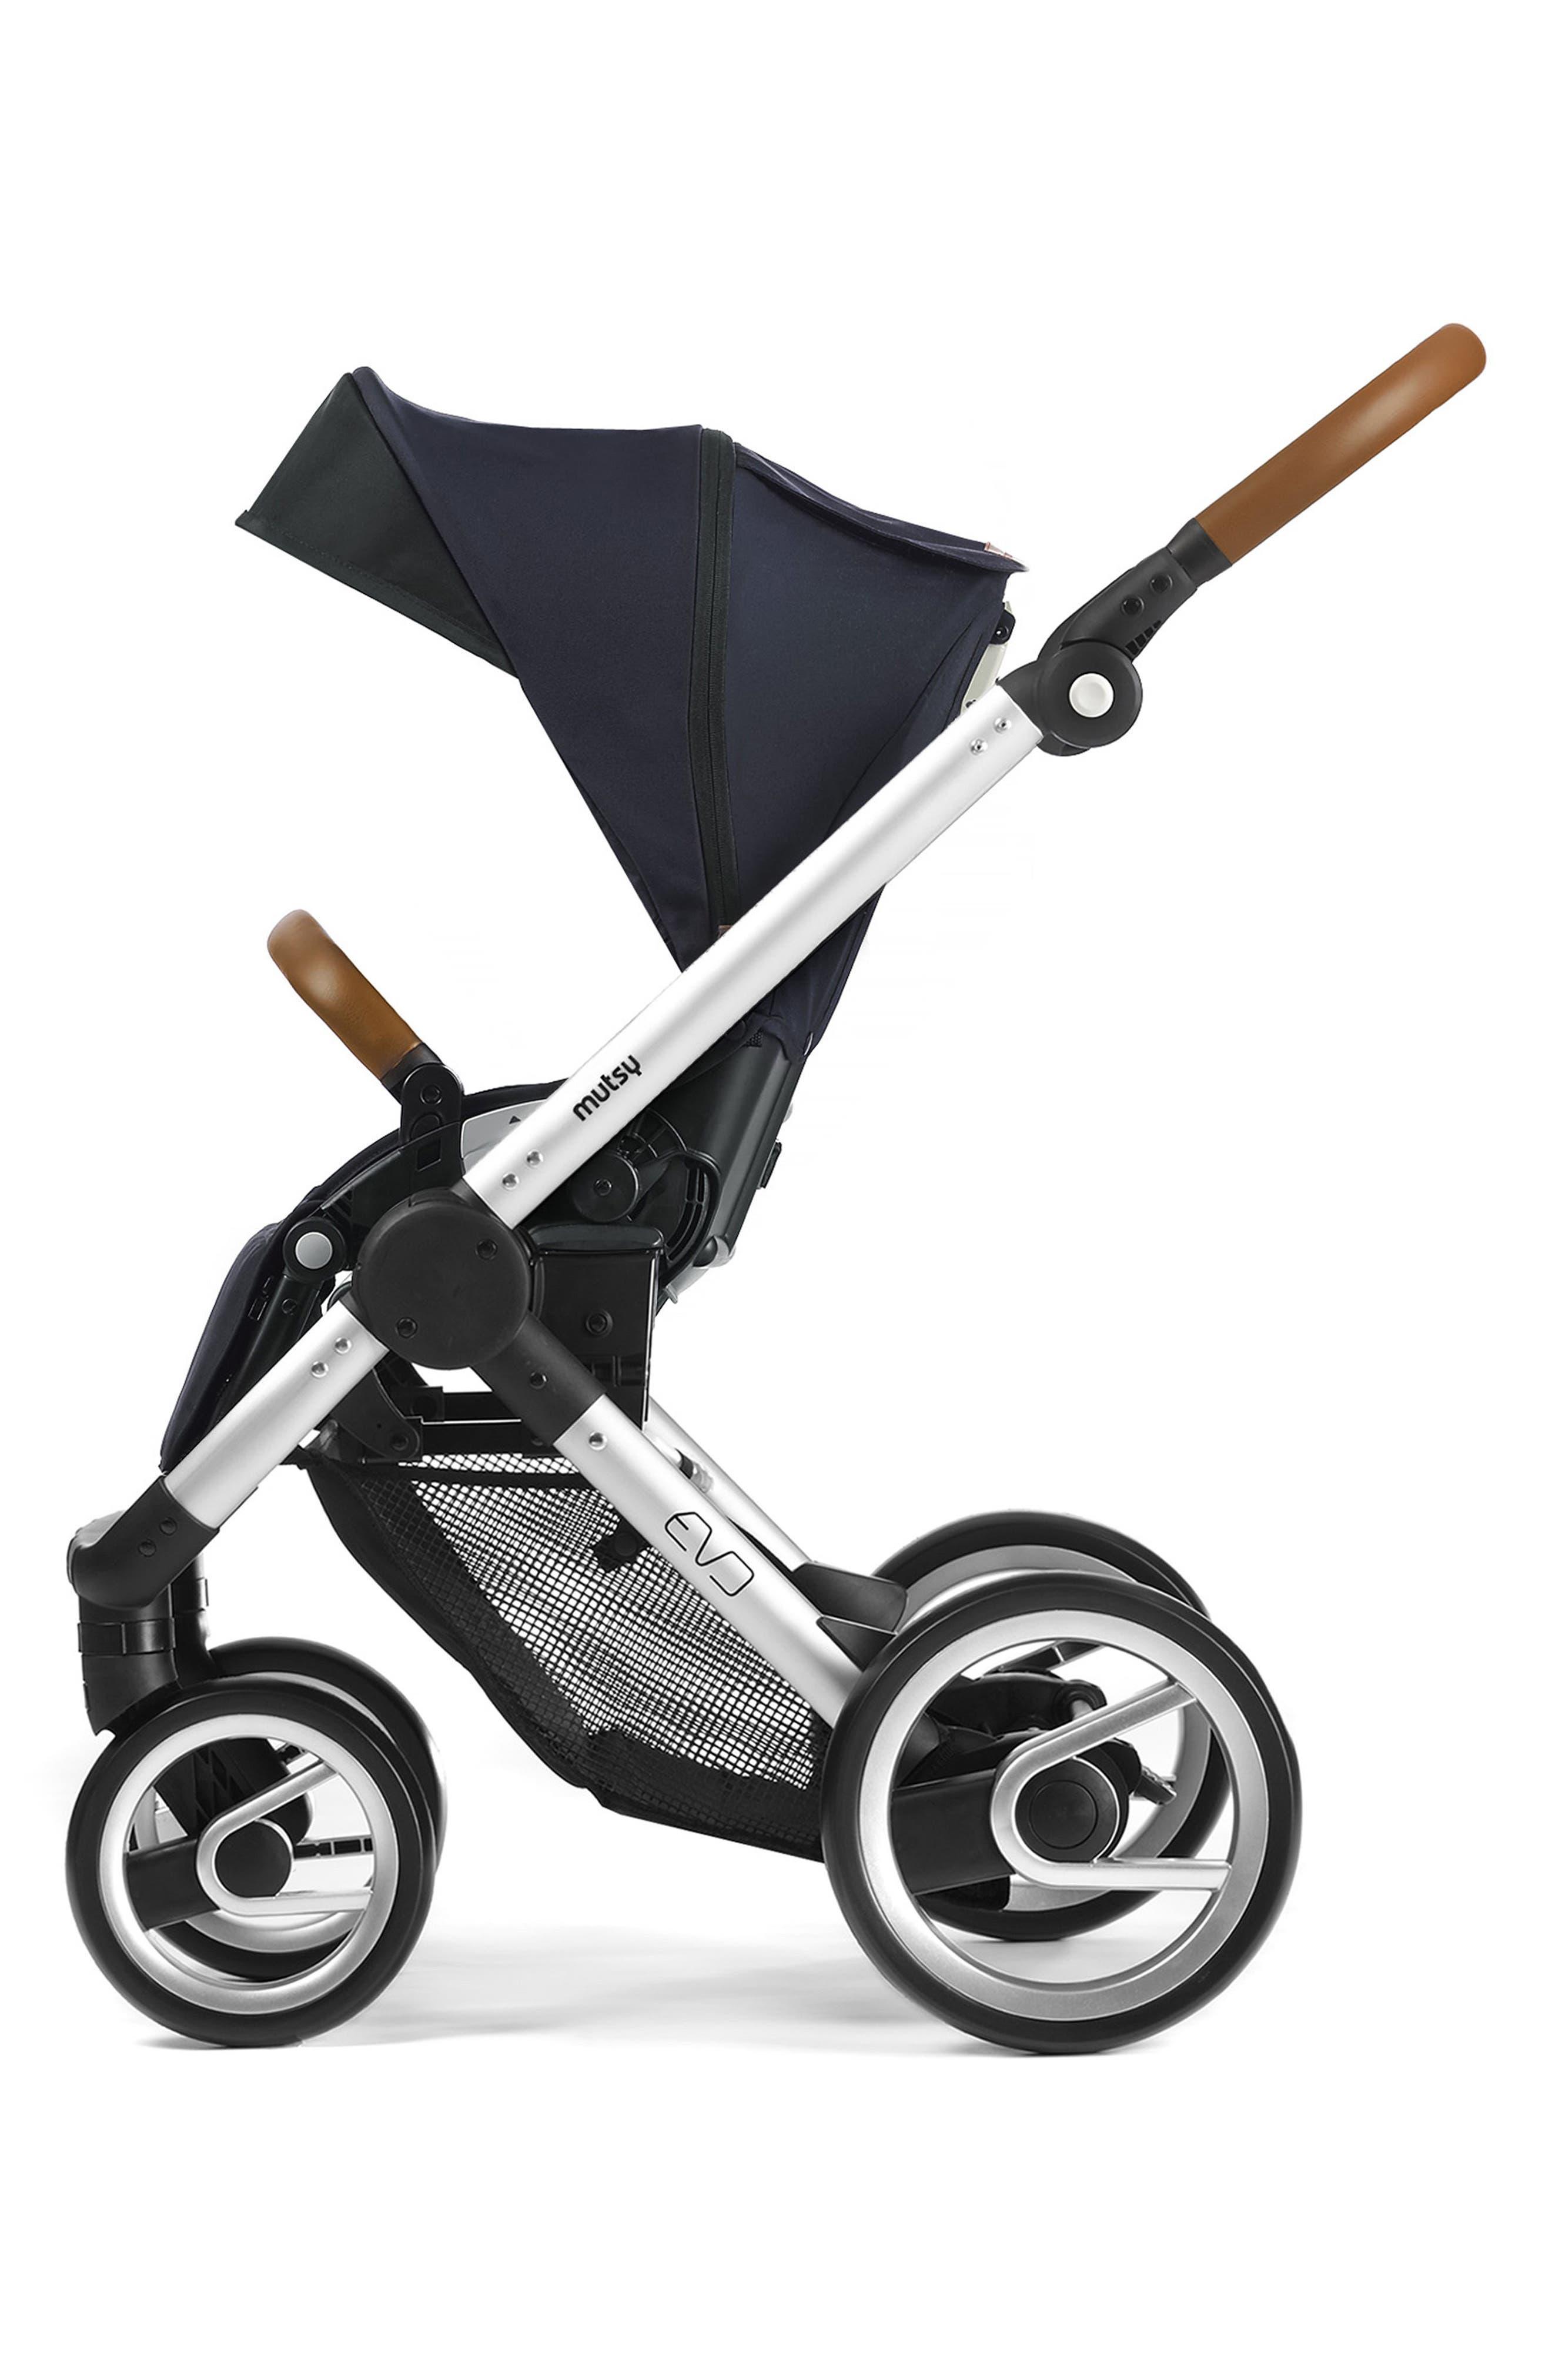 Evo - Urban Nomad Stroller,                             Alternate thumbnail 4, color,                             040